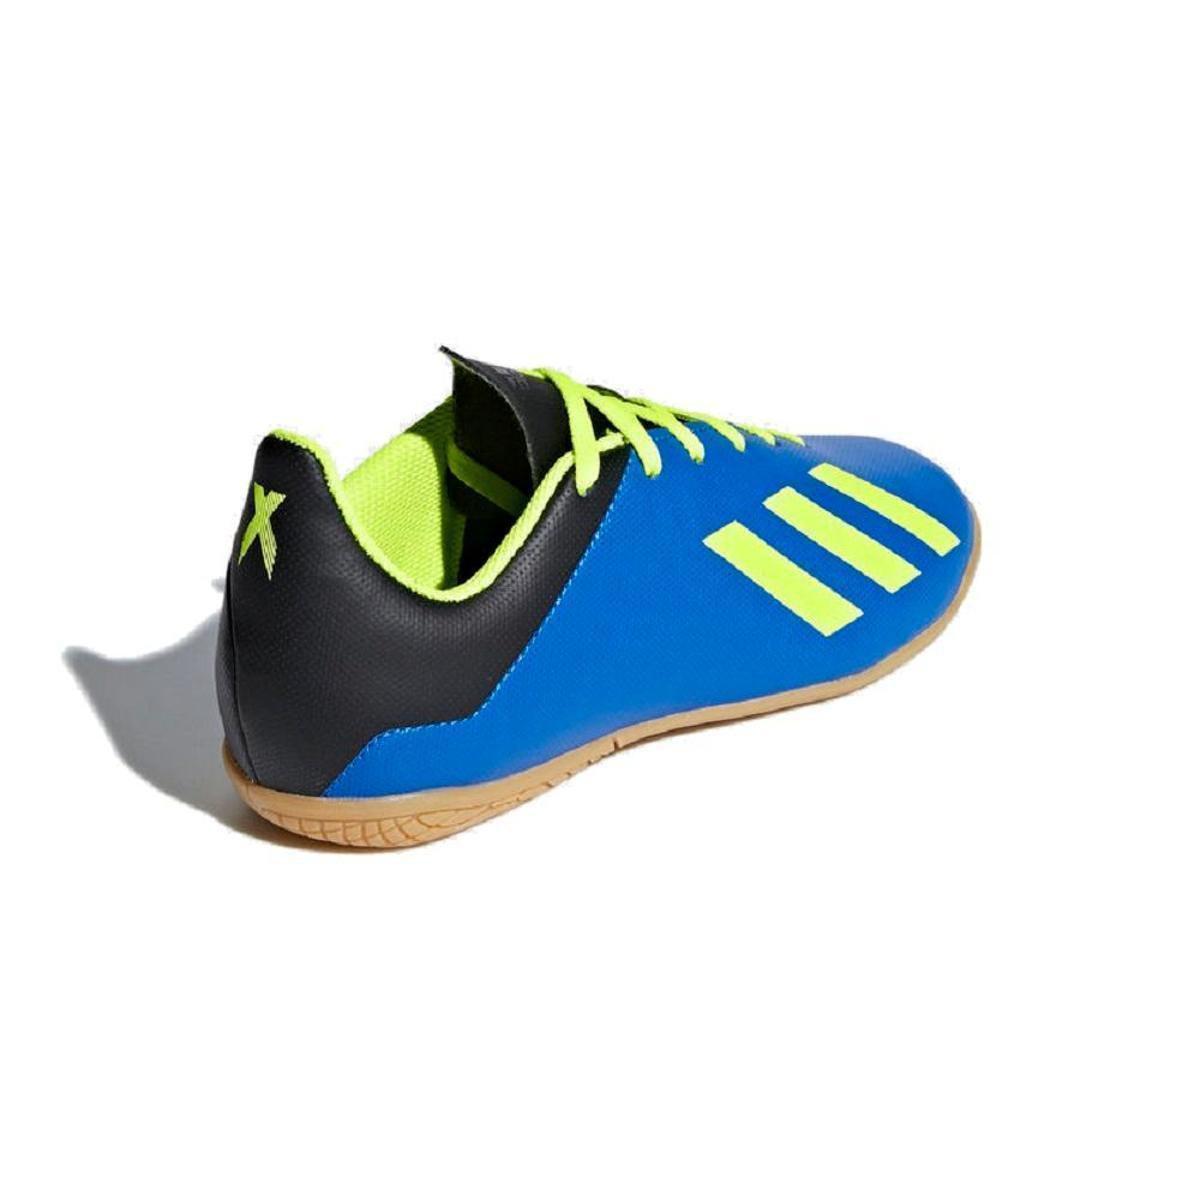 b9d3dd4cba Chuteira Futsal Infantil Adidas X Tango 18 4 In - Azul e amarelo ...